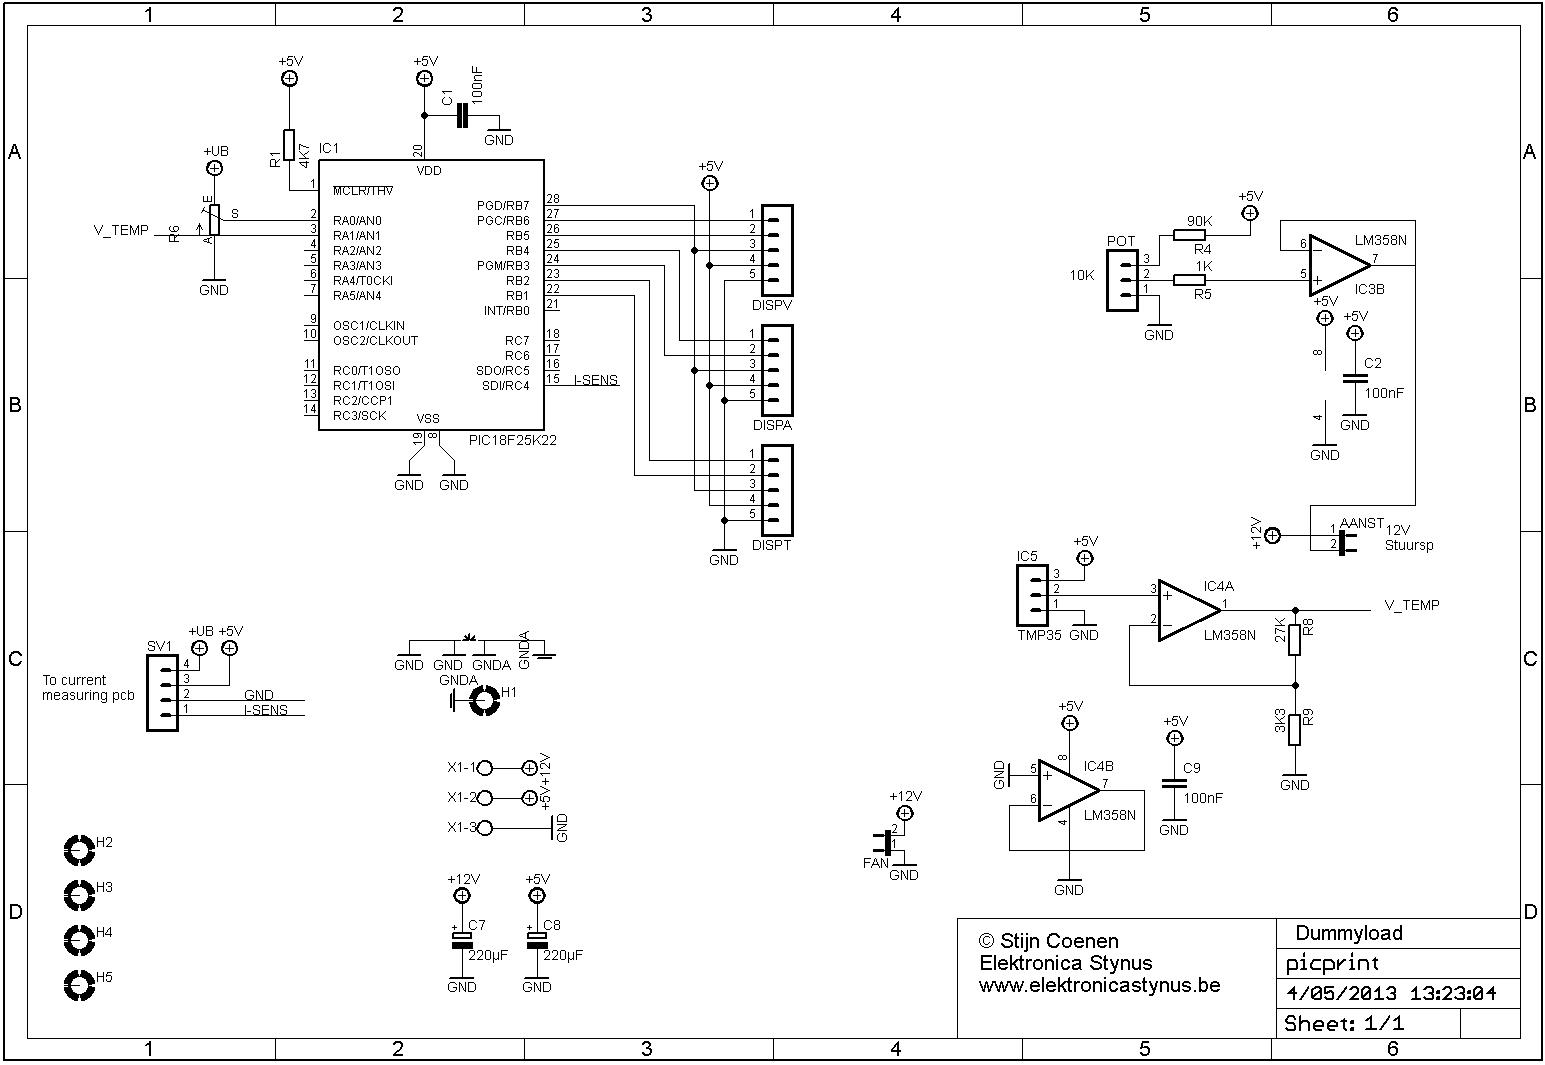 http://elektronicastynus.be/image/77/Main_schema.png